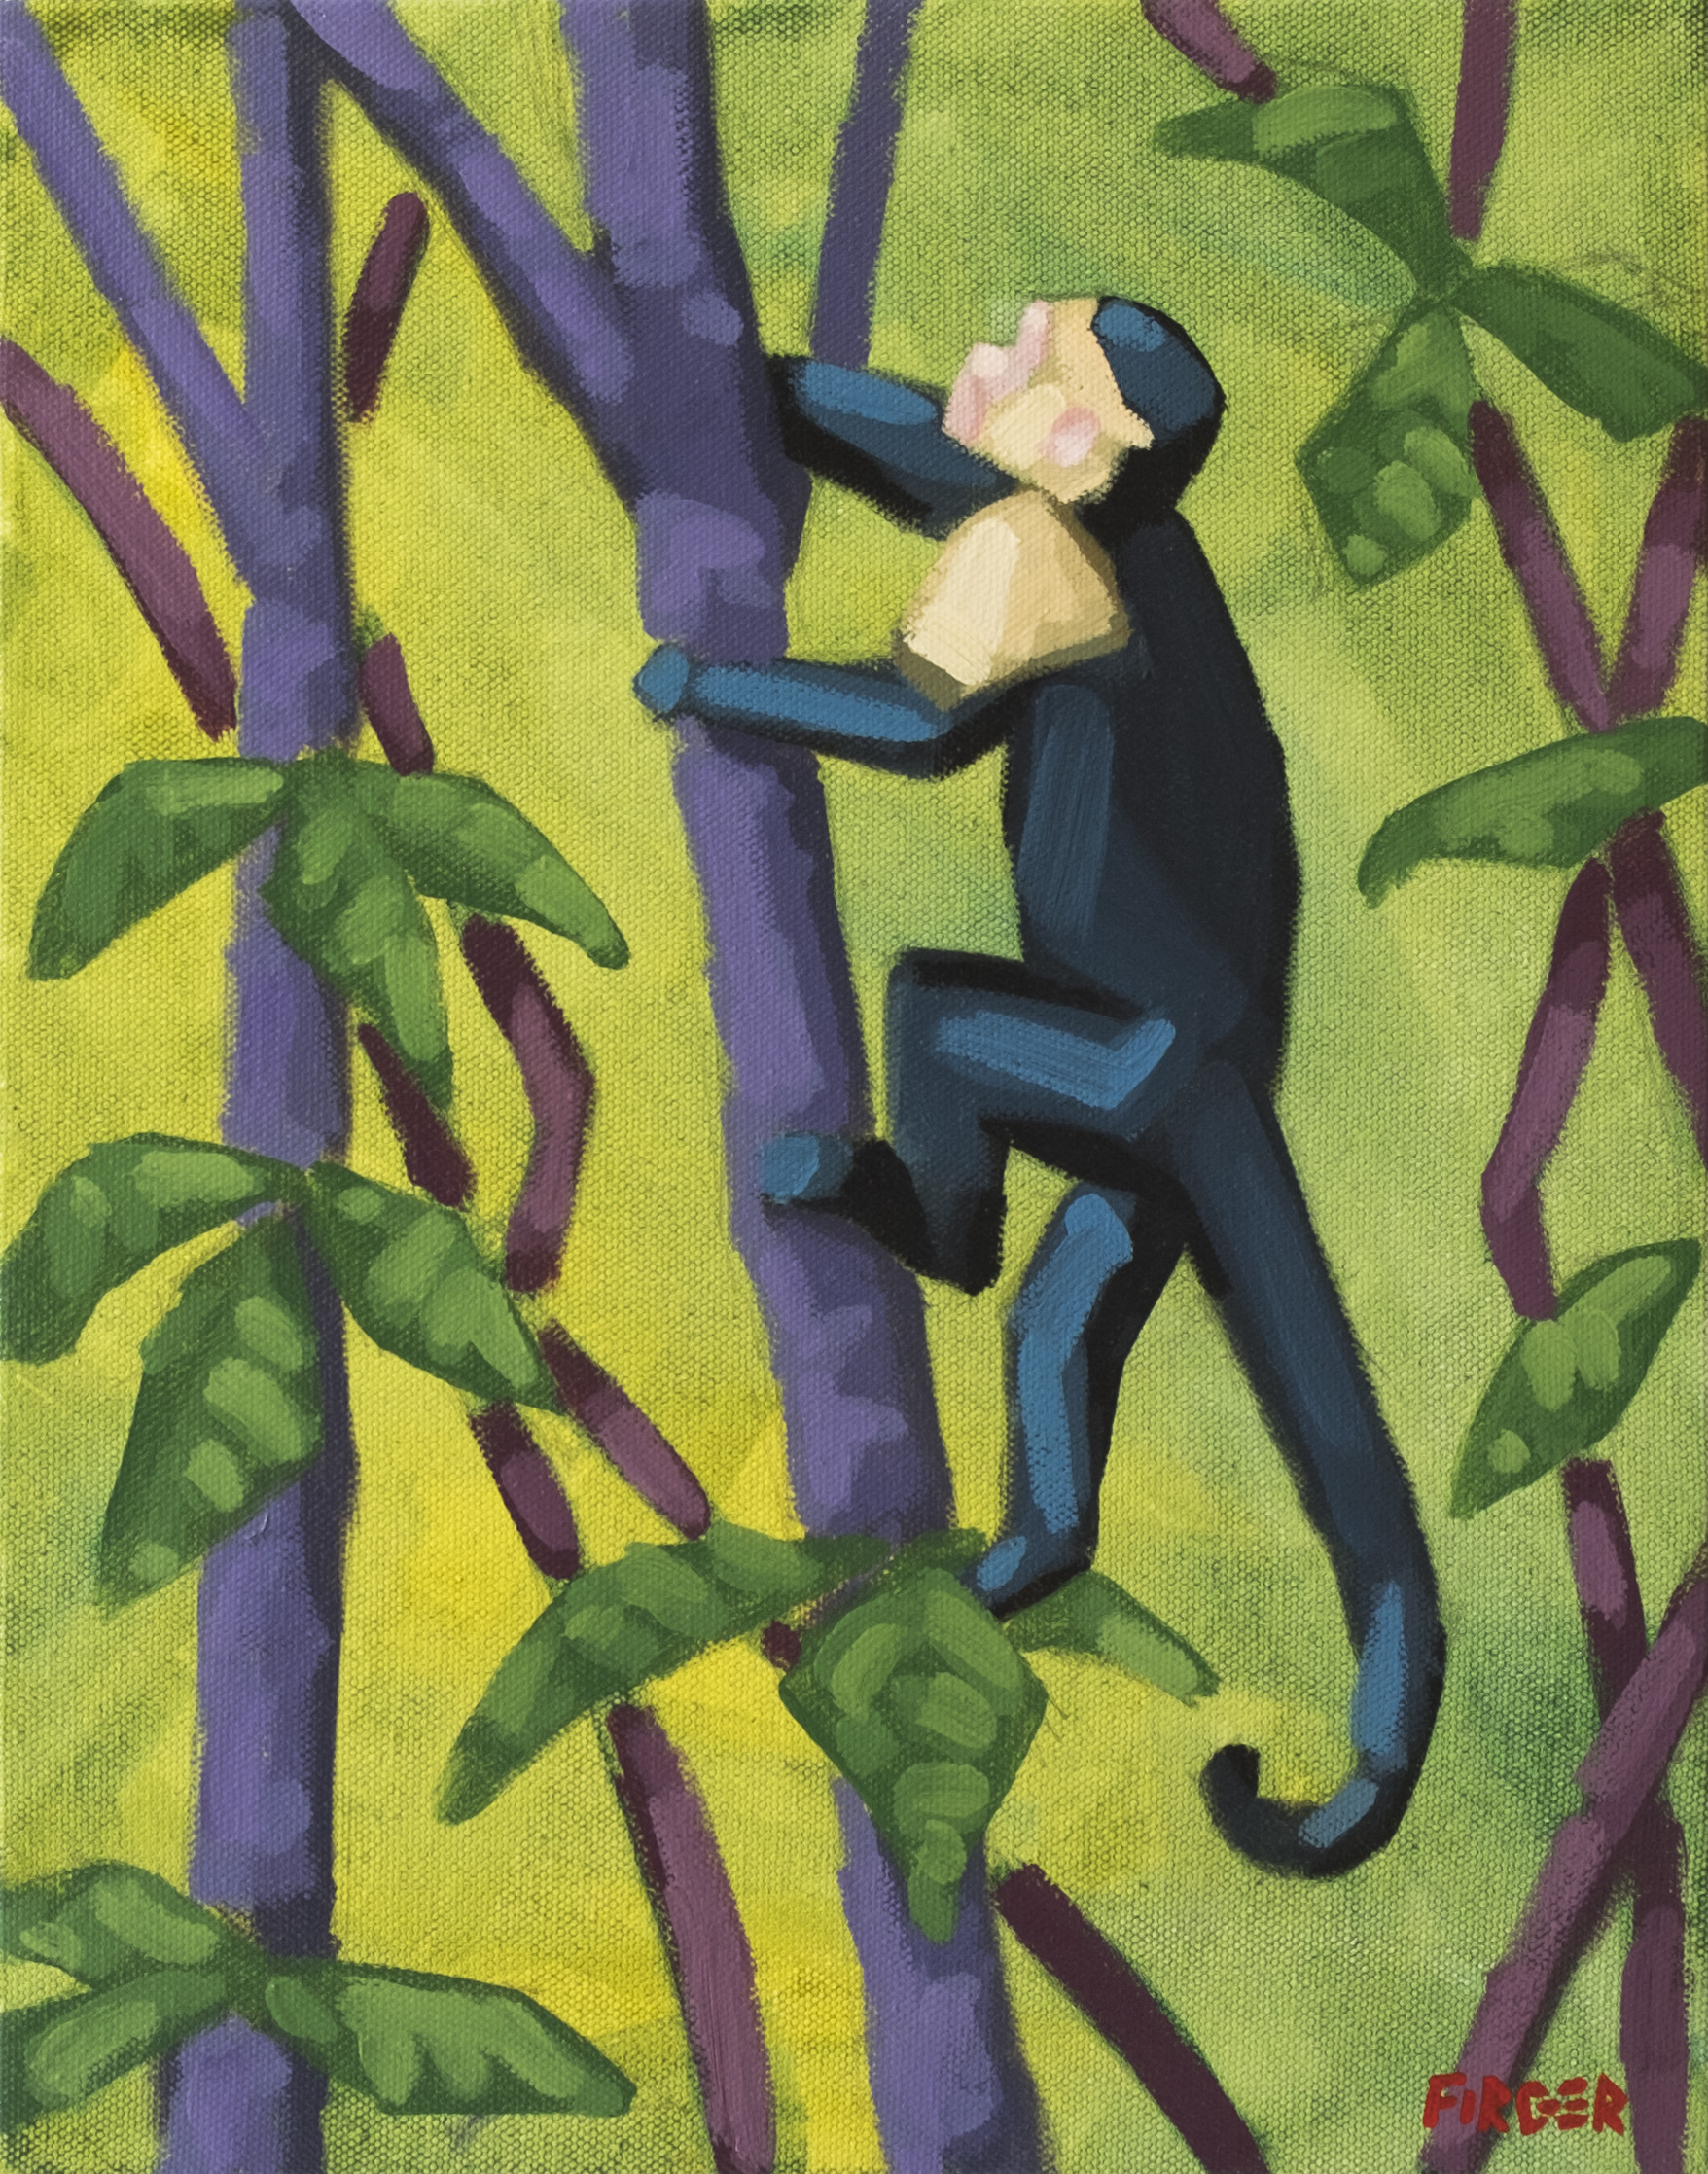 Jungle Climber I - 11 x 14, Acrylic on Canvas